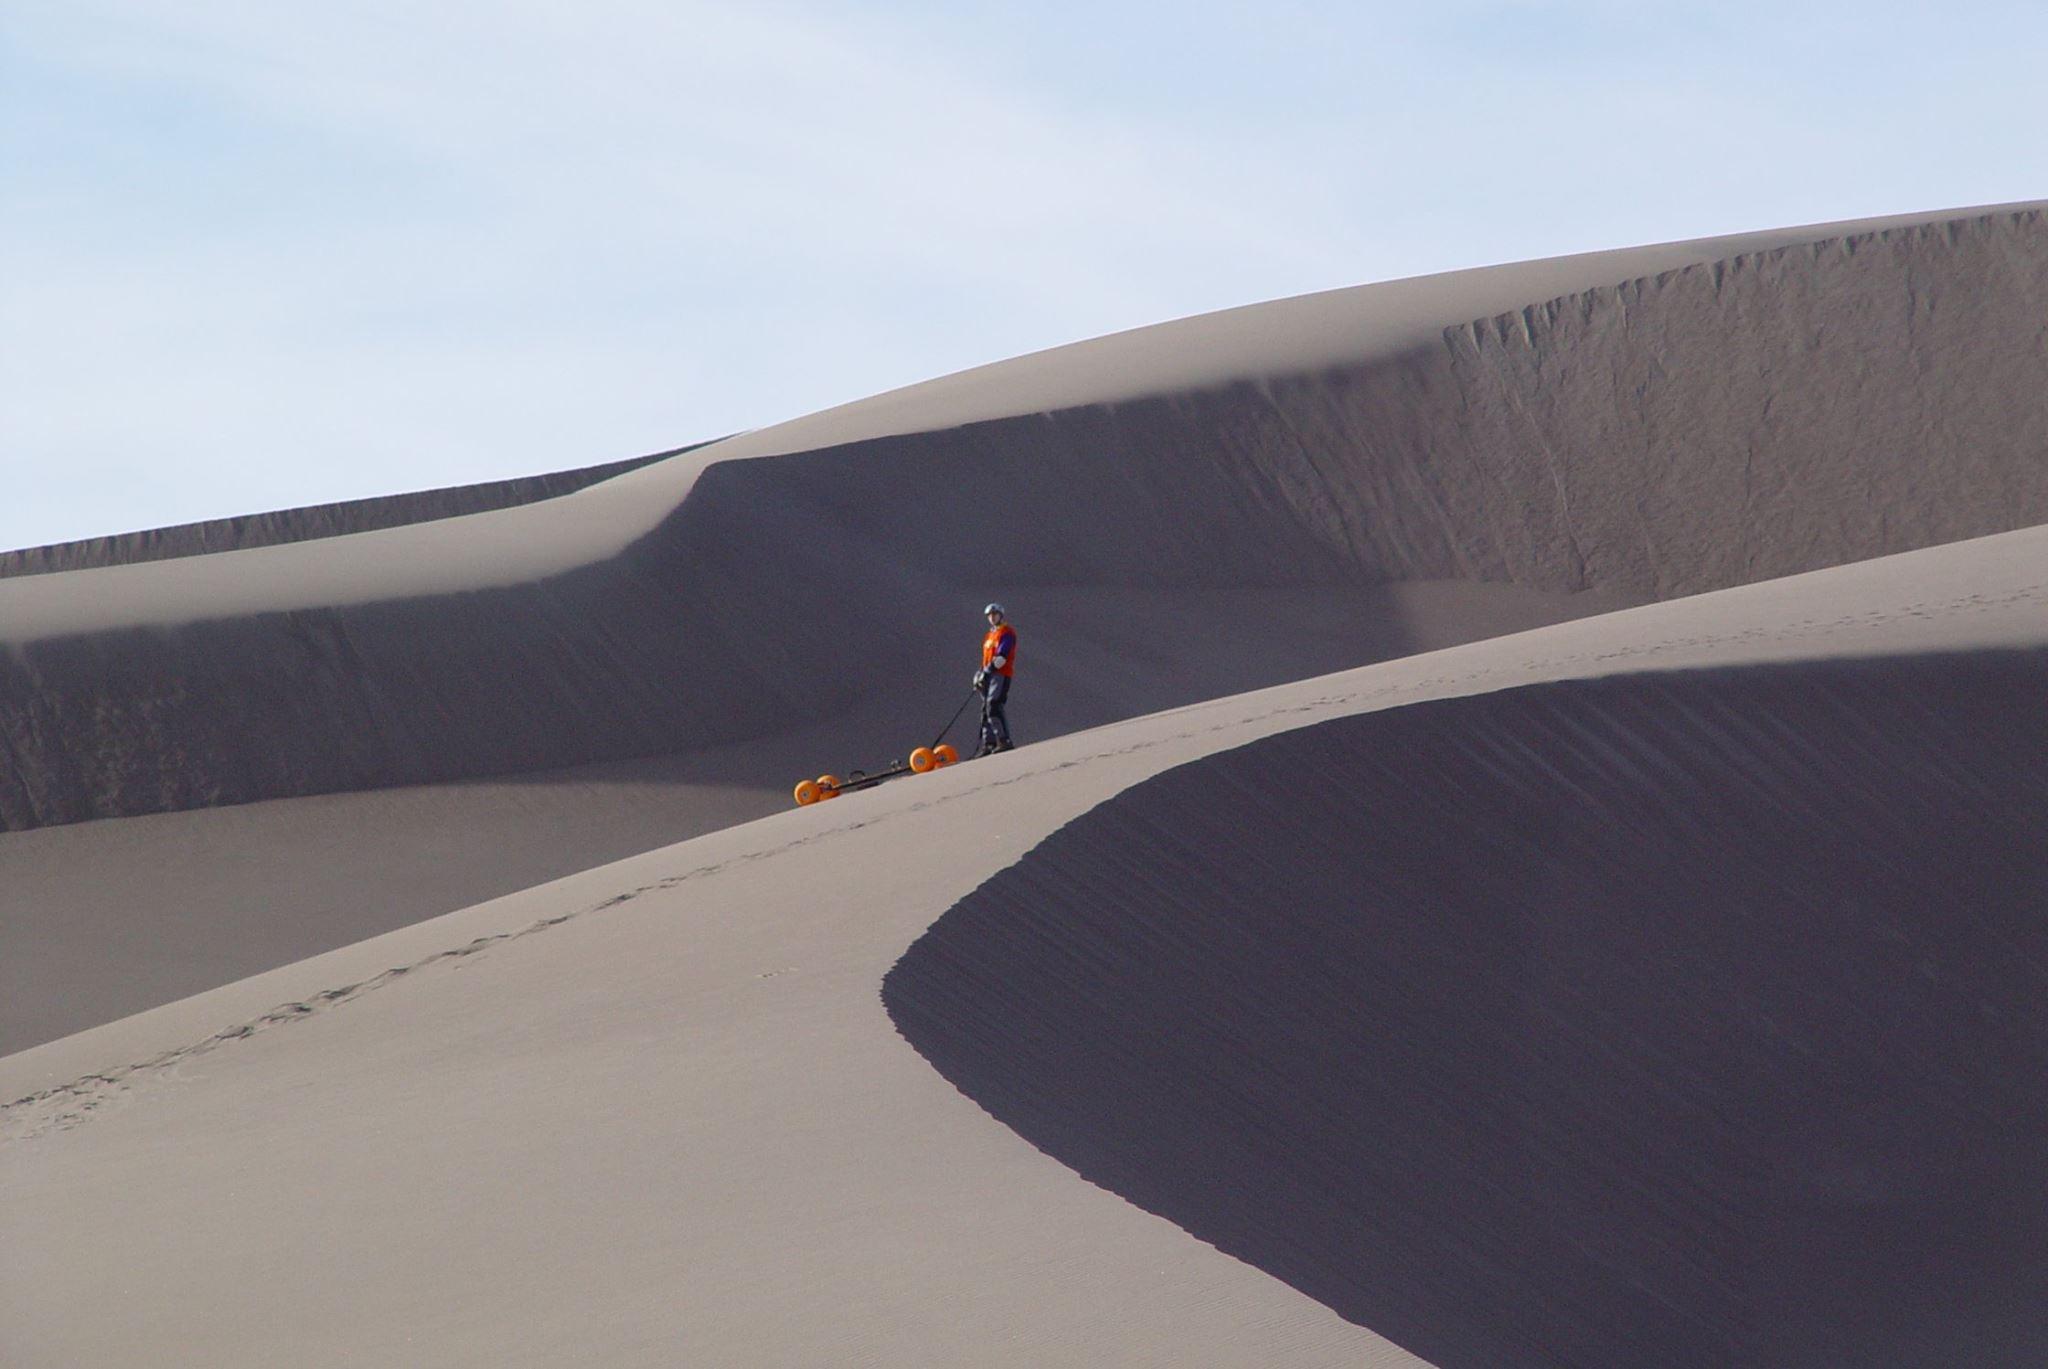 patrick_on_sand_dunes